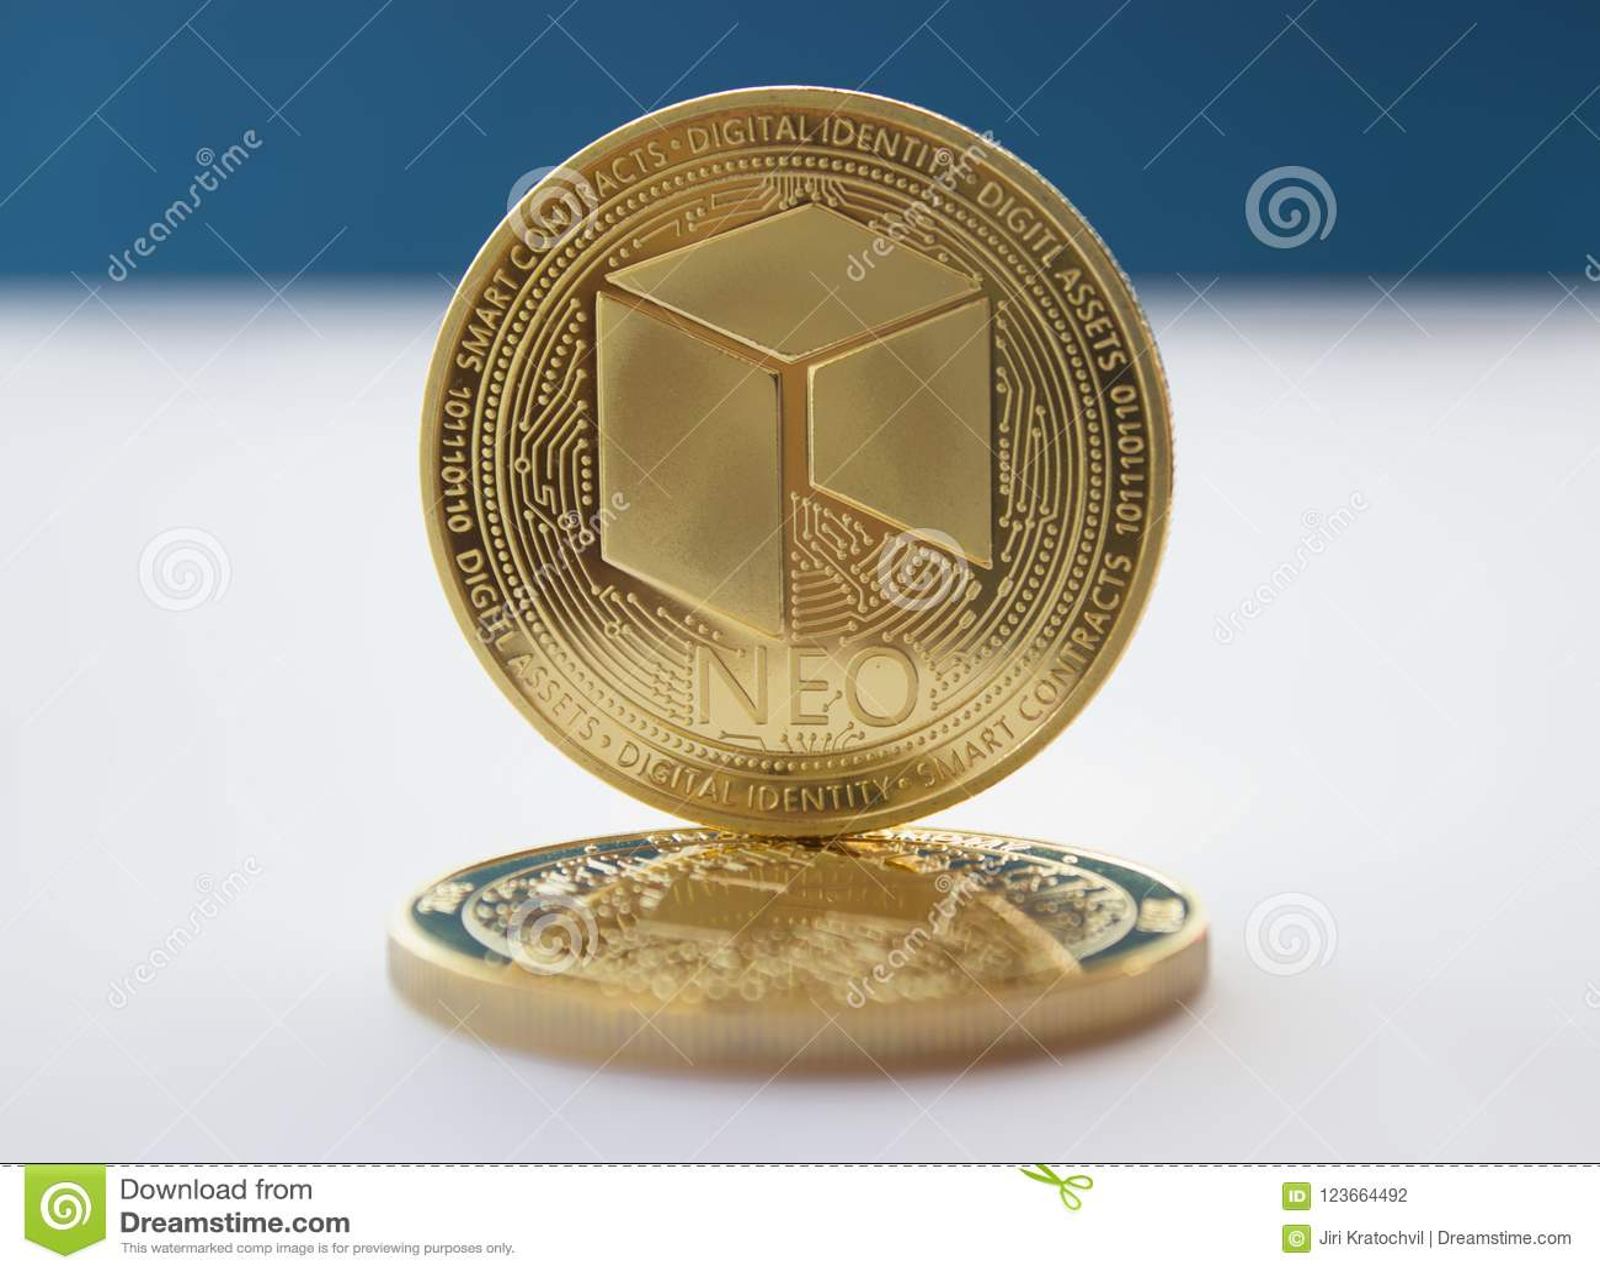 Crypto νομίσματα νομίσματος νεω στο μπλε υπόβαθρο 2